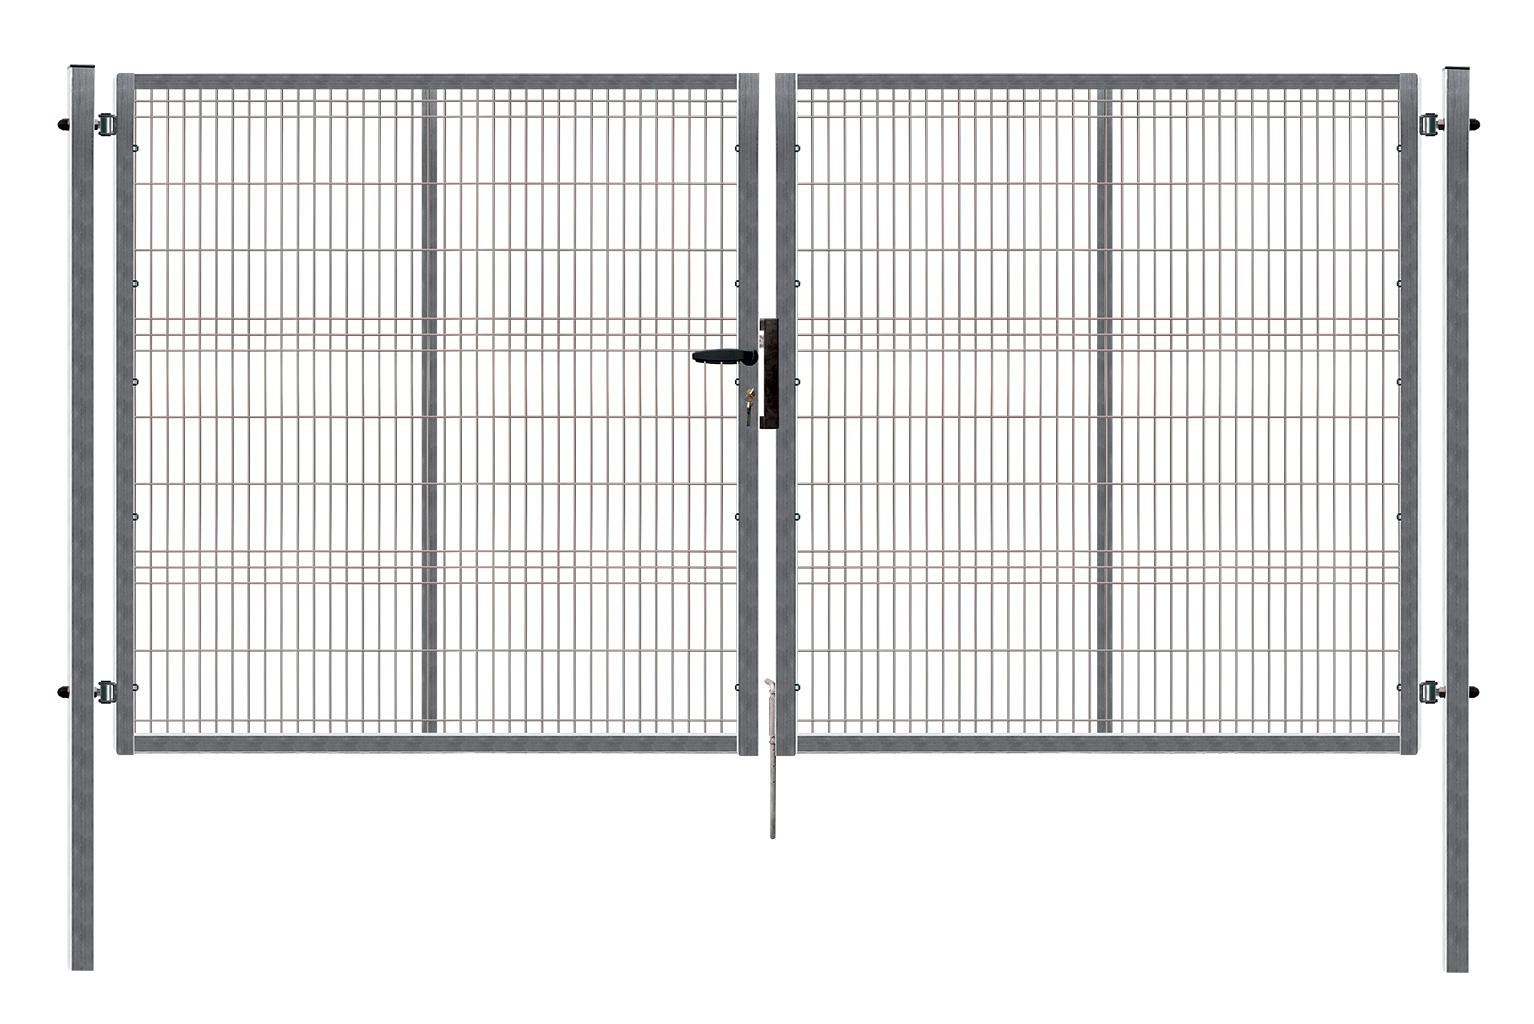 Brána PILOFOR dvoukřídlá, 4118x1545 mm, Zn 67,6Kg